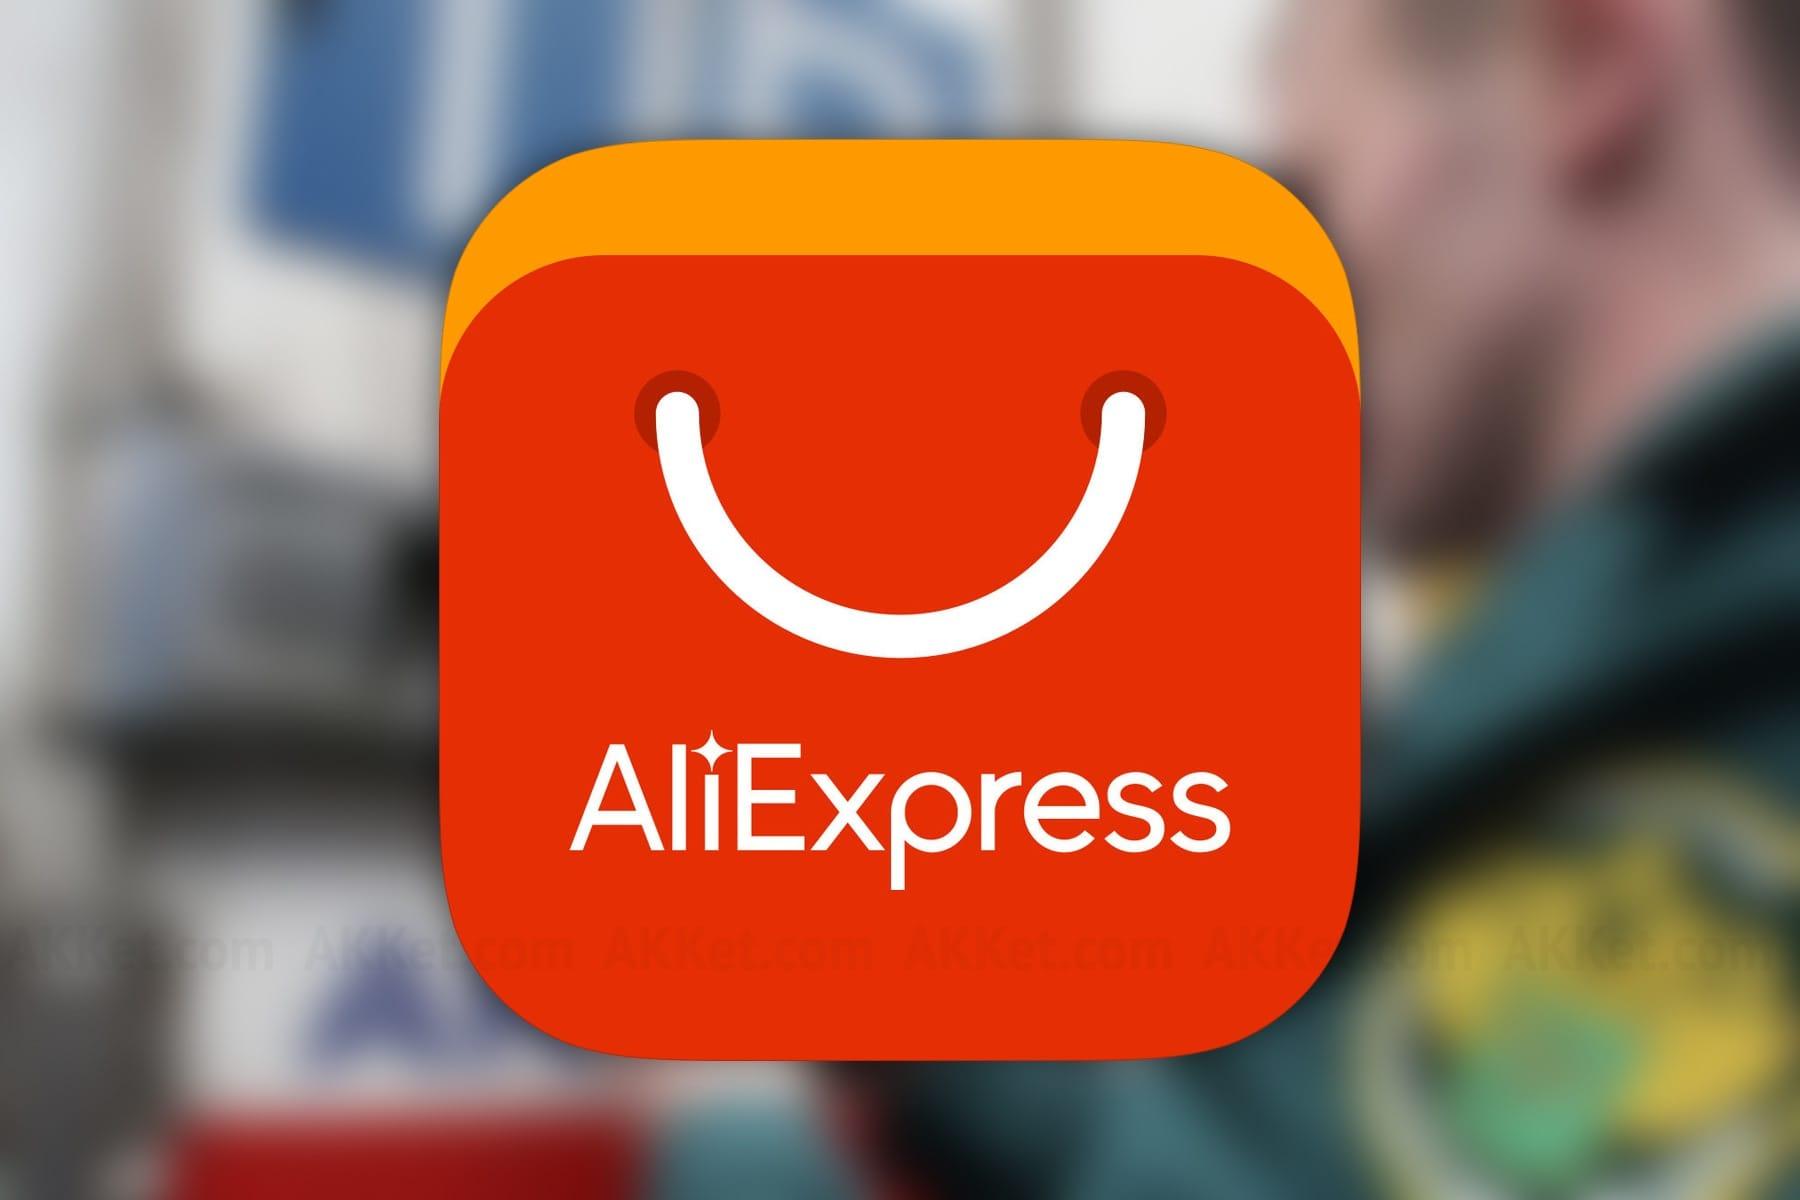 AliExpress logo. Credit: HaggleDog.com